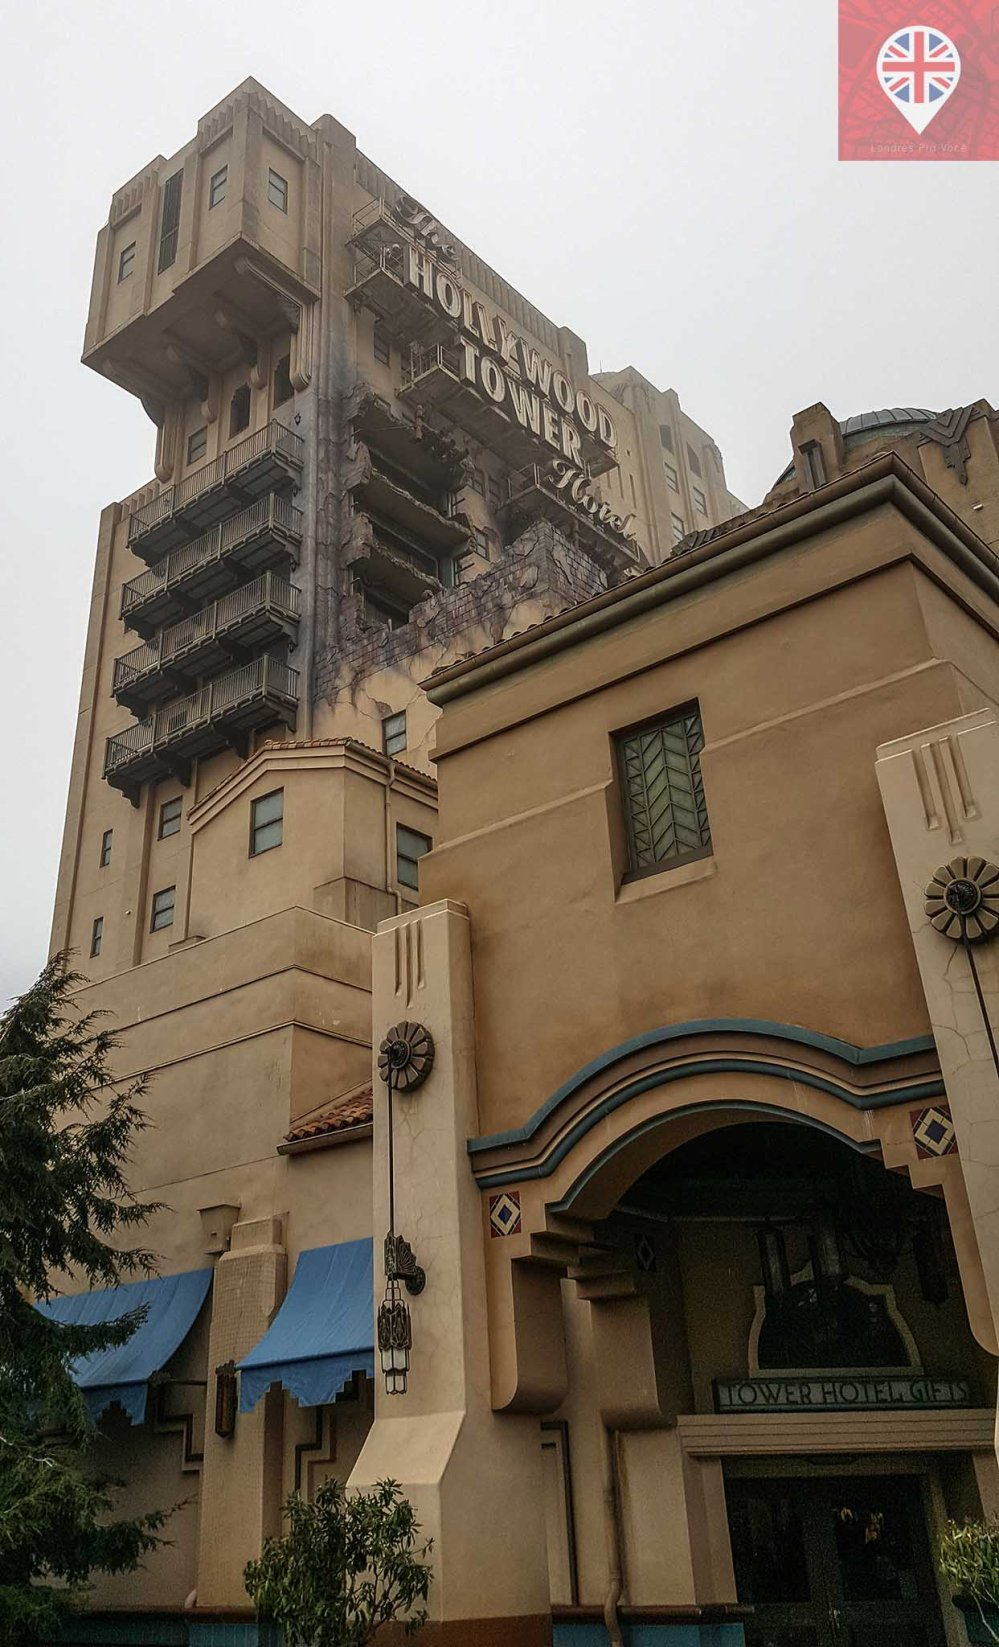 Disney Studios Tower of Terror